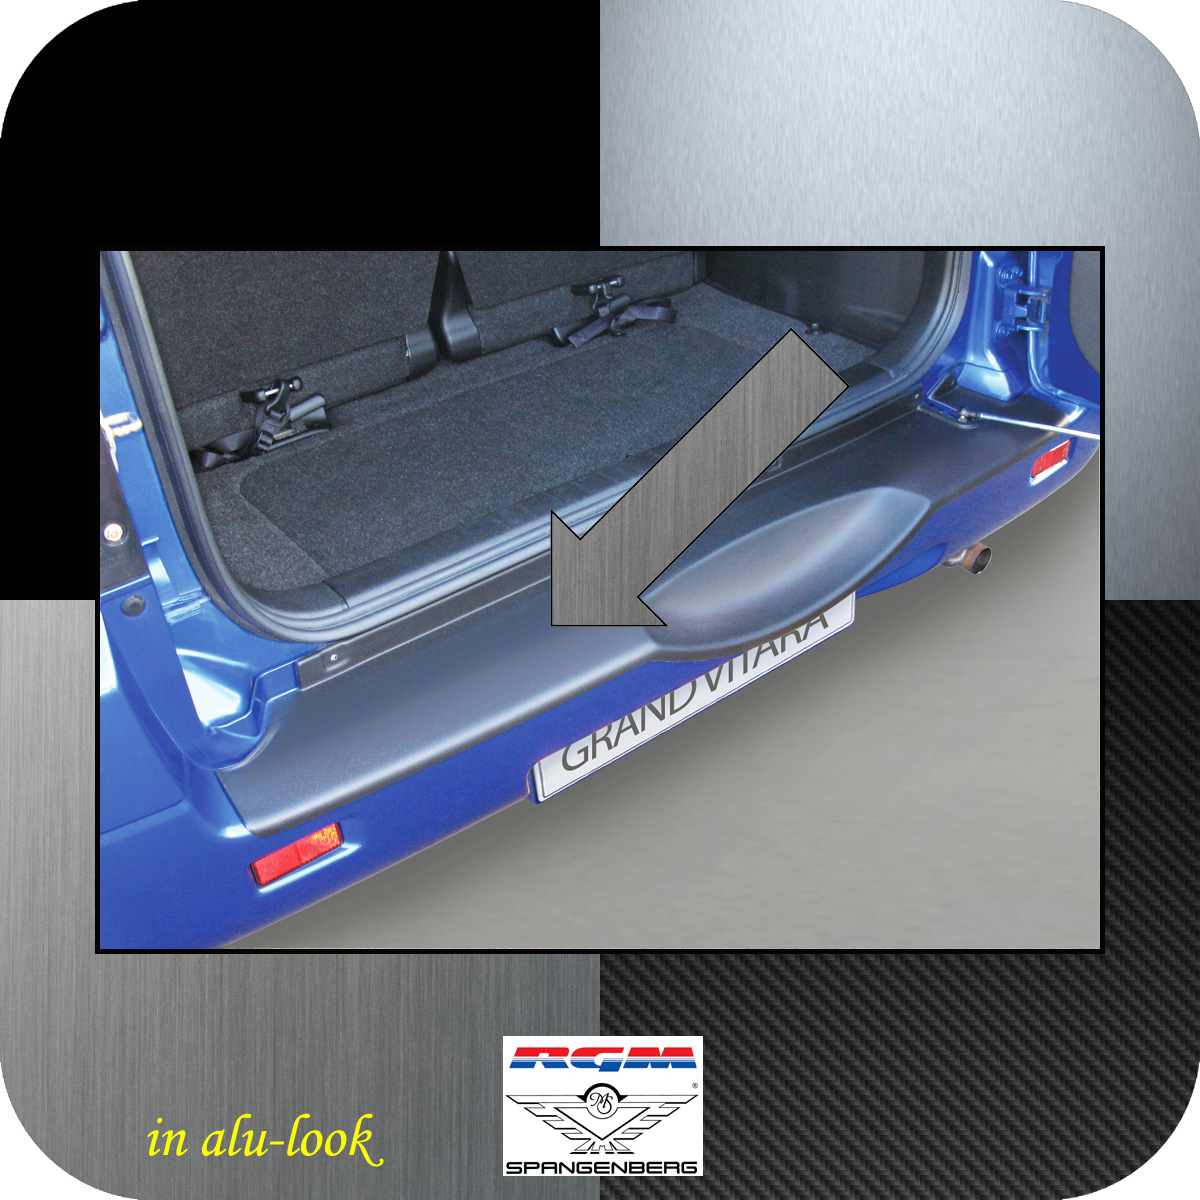 Ladekantenschutz Alu-Look Suzuki Grand Vitara II Radhalter 2005-2015 3504553